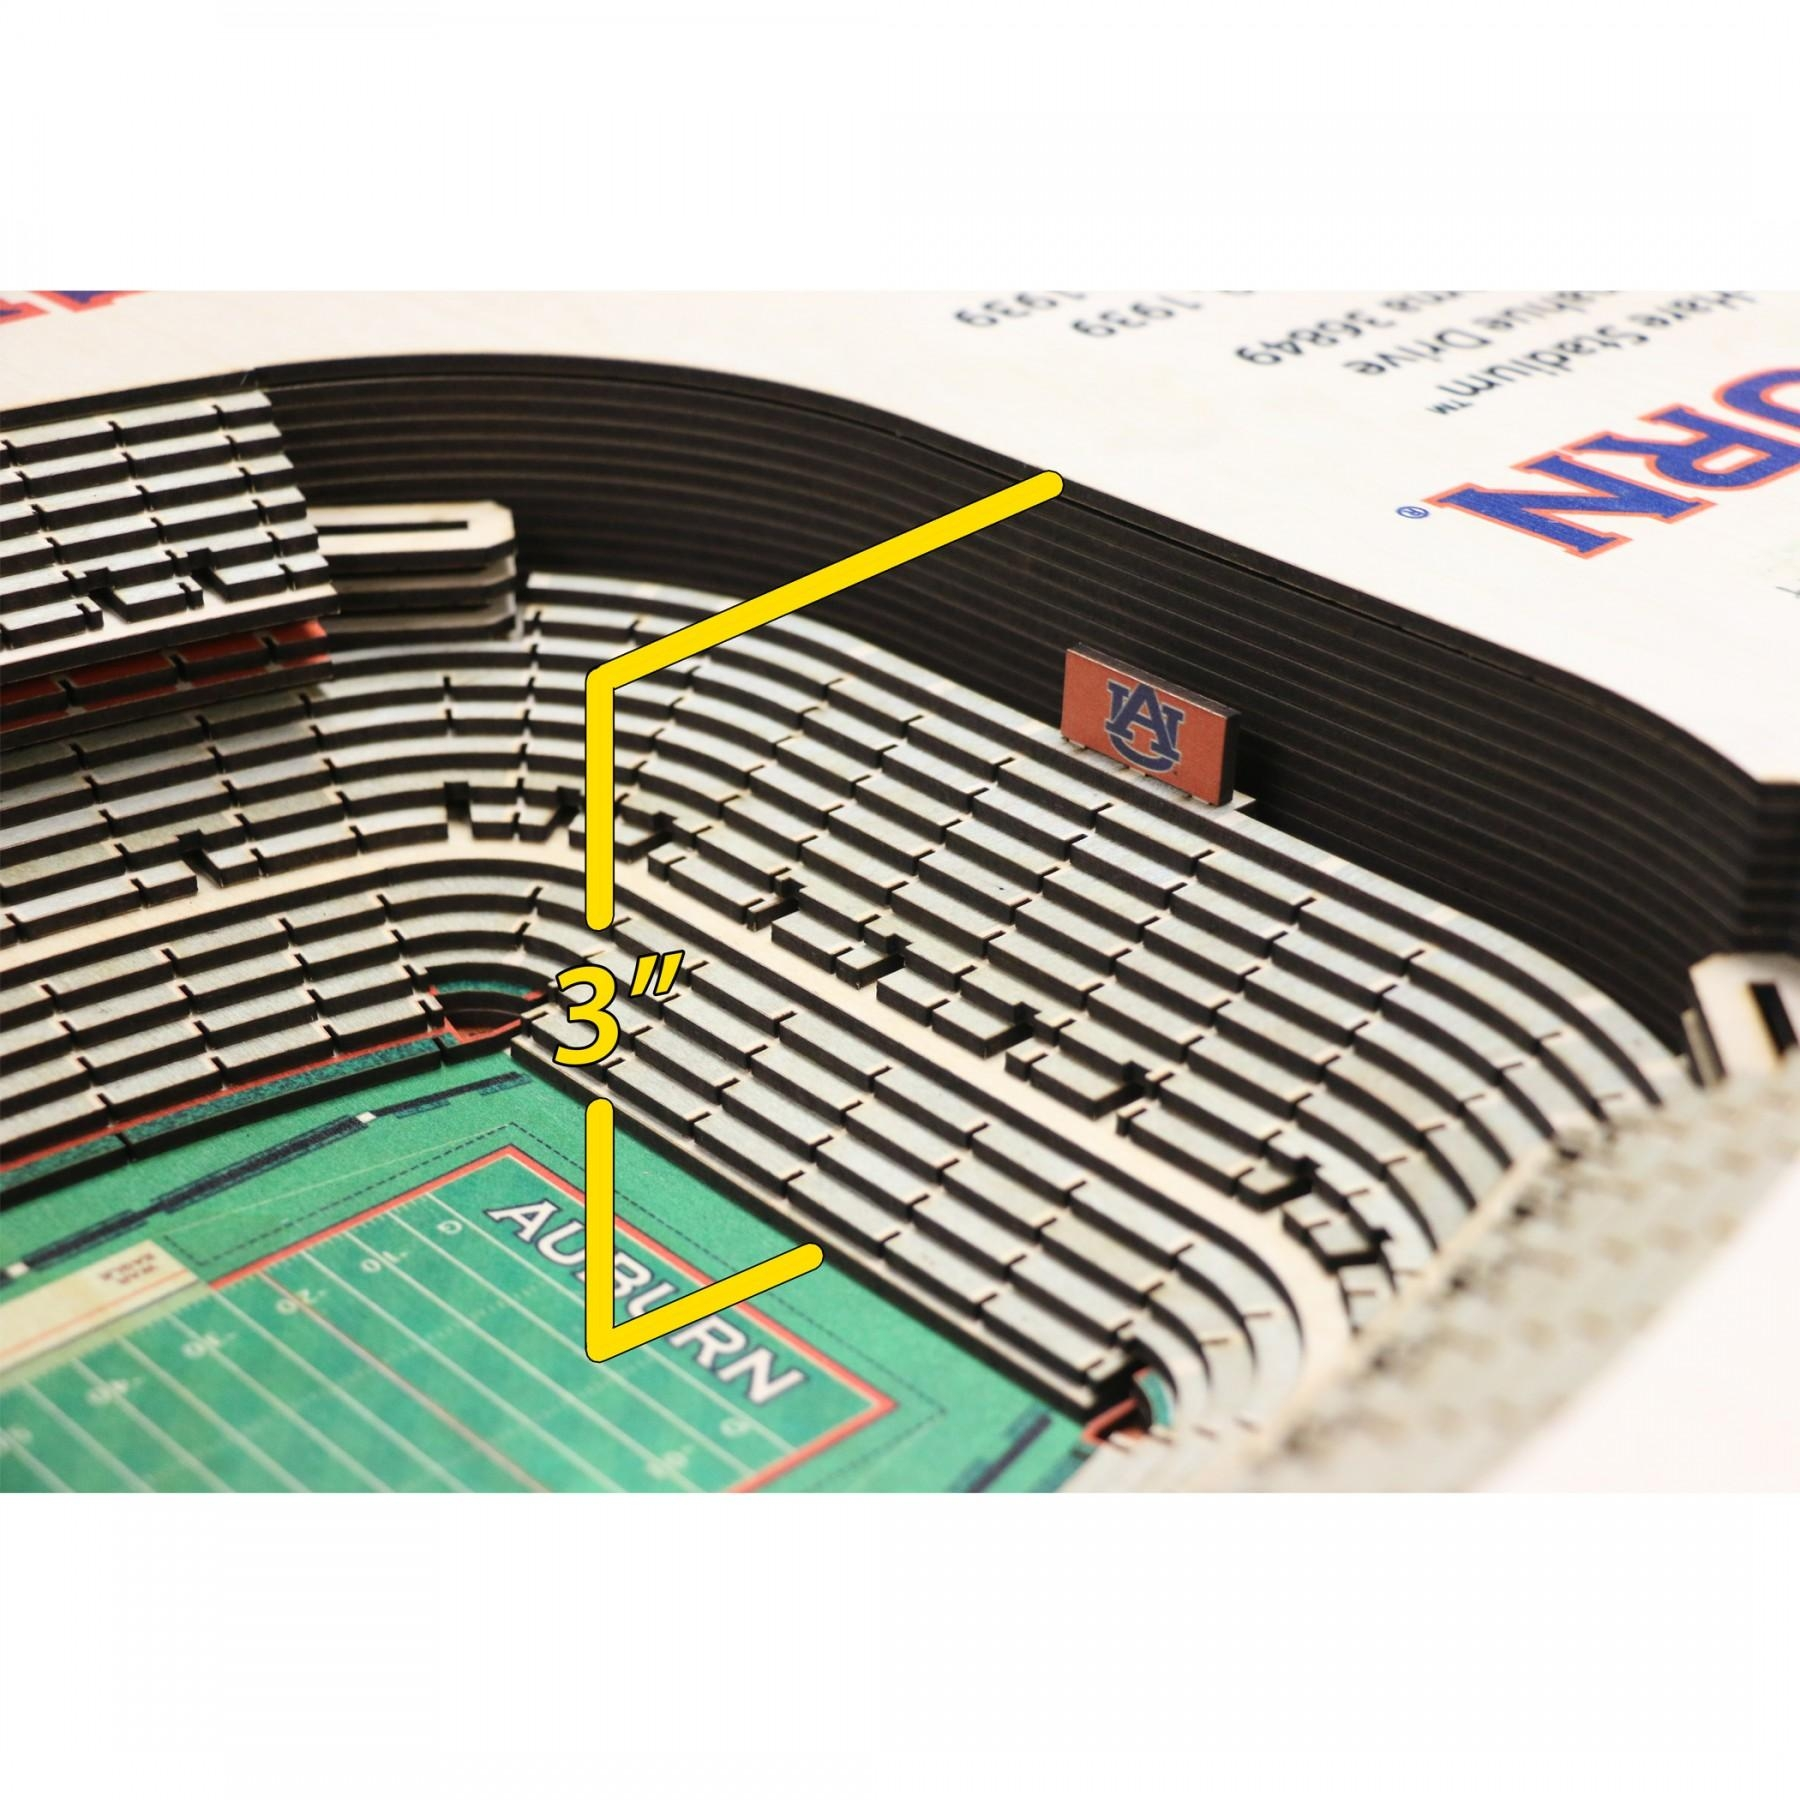 Auburn Tigers Stadiumview Wall Art – Jordan Hare Stadium 3 D With Regard To Auburn Wall Art (Image 10 of 20)